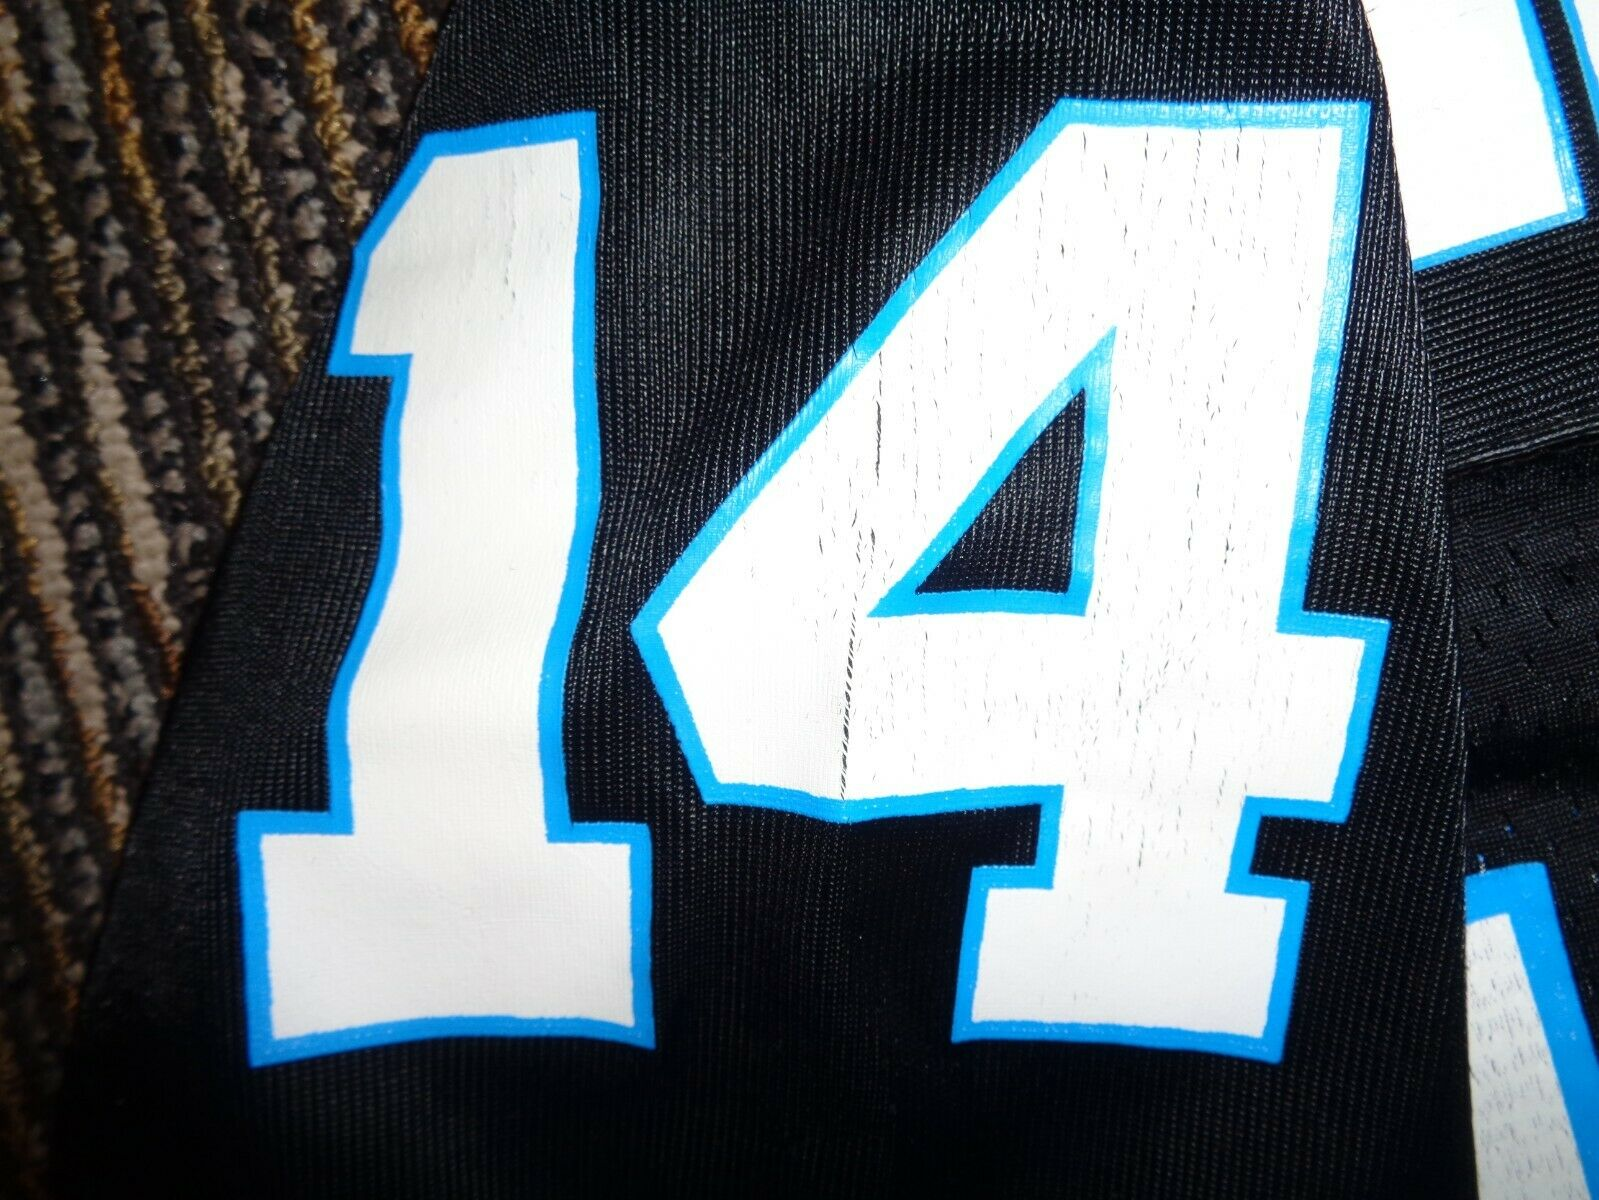 FRANK REICH 14 CAROLINA PANTHERS STARTER BLACK MENS NFL GAME FOOTBALL JERSEY XL - $39.99